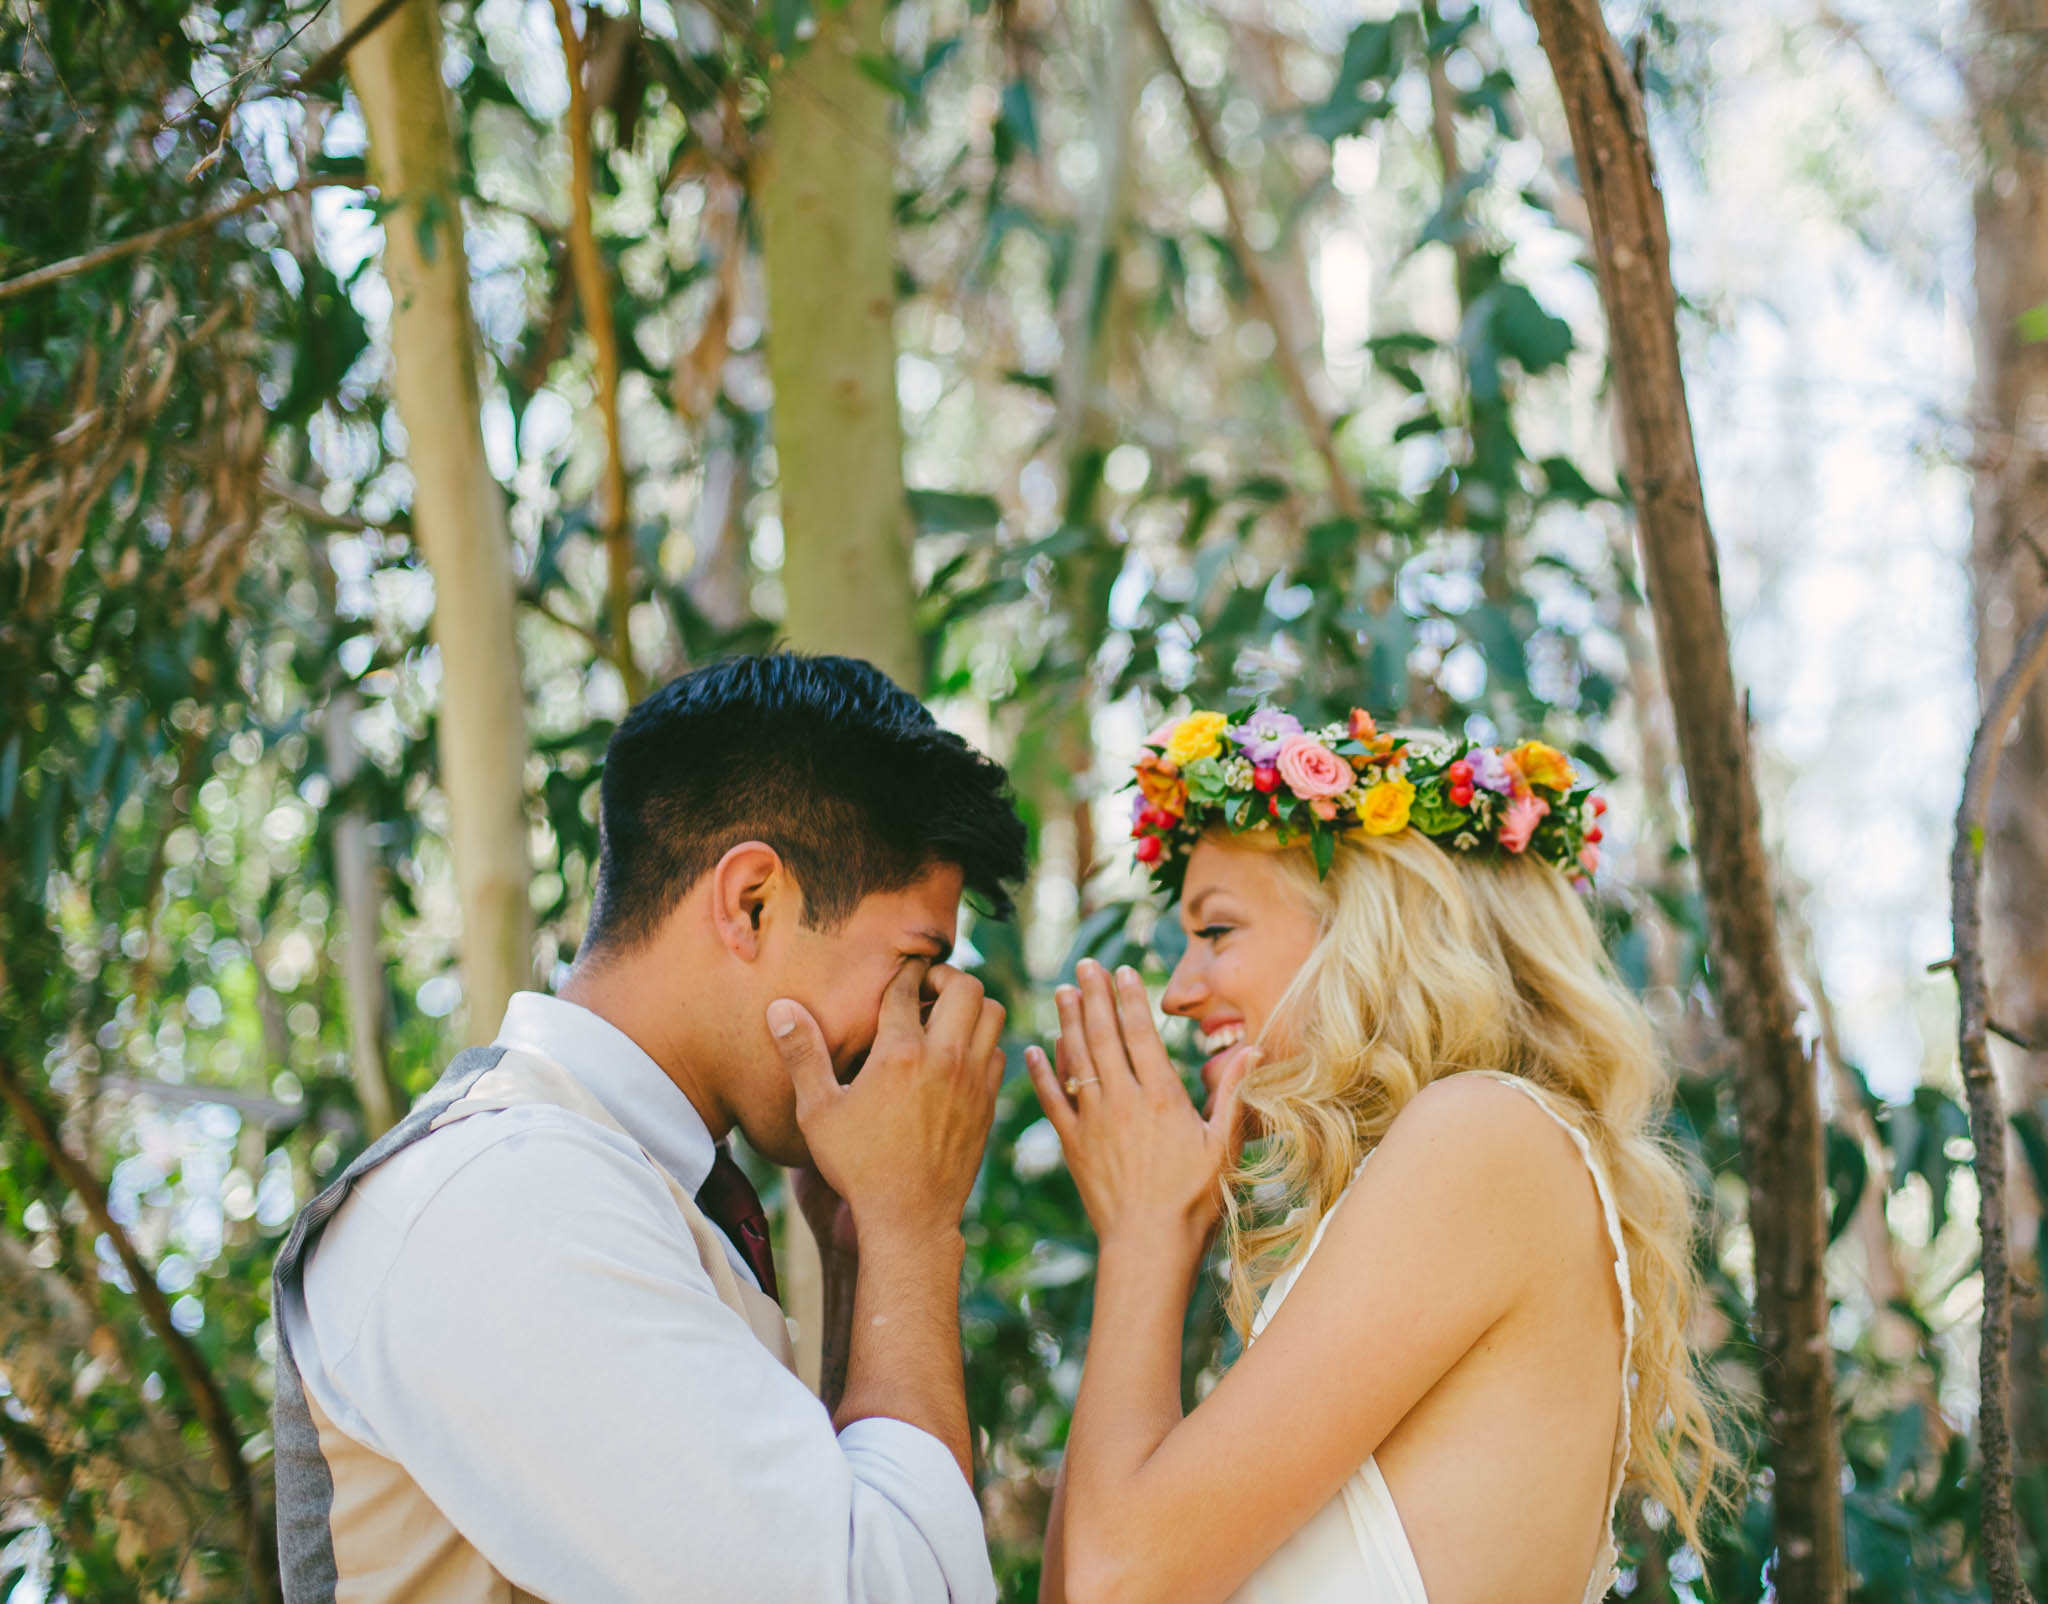 ©Isaiah & Taylor Photography - Los Angeles Wedding Photographer - Mexican Bohemian Wedding, Laguna Niguel Regional Park, Orange County-13.jpg